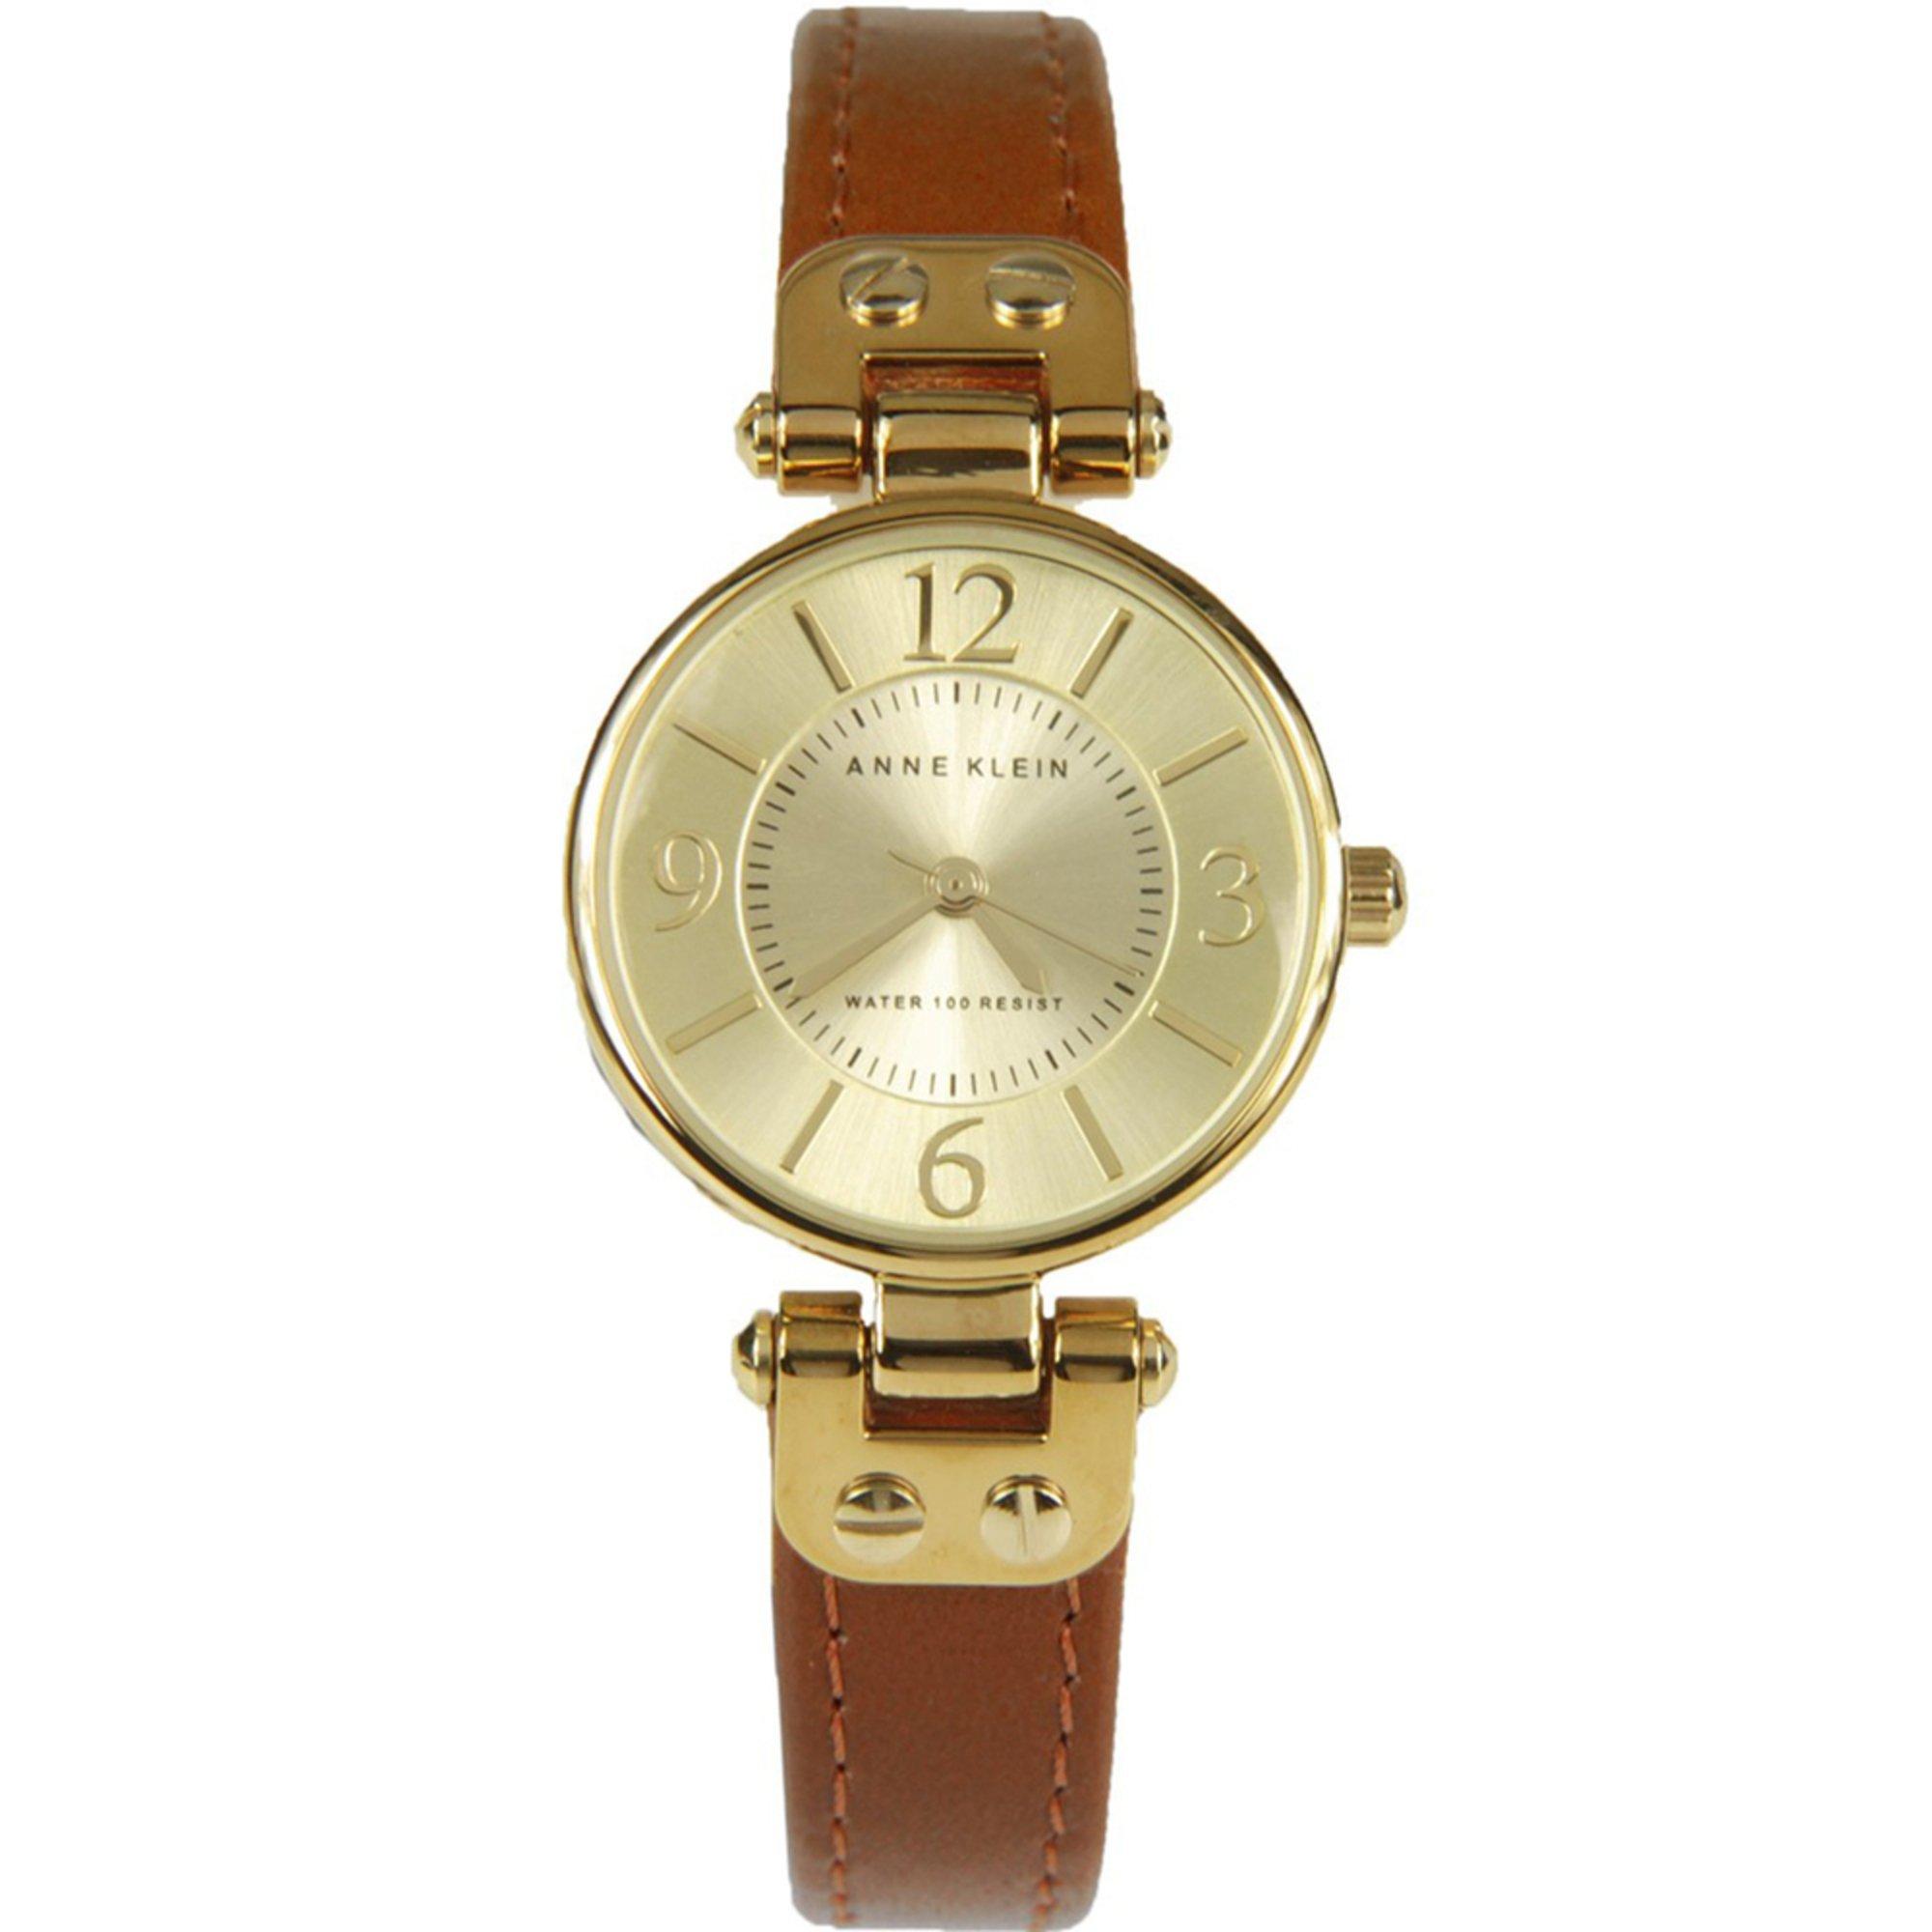 Anne klein women 39 s brown leather strap watch 26mm women 39 s watches accessories shop your for Anne klein leather strap